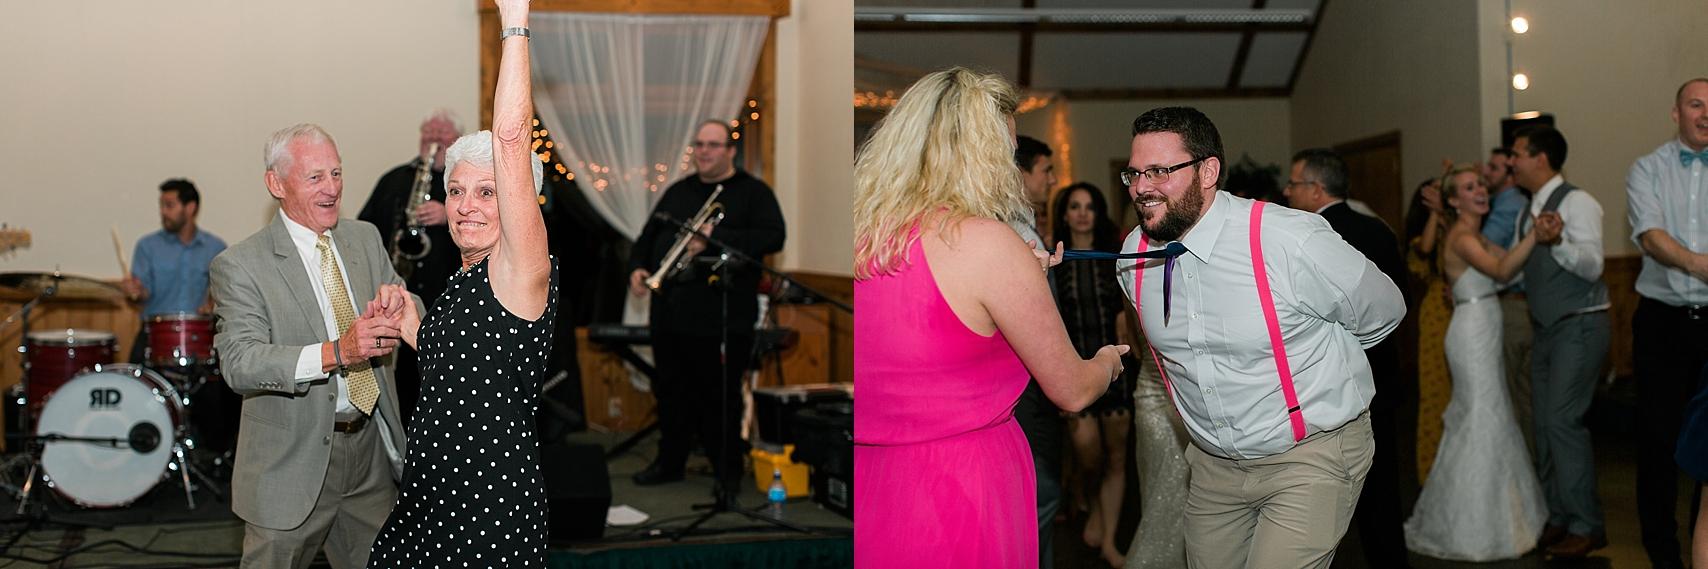 Minnesota Minneapolis Wedding Photographer Best Of 2018 Weddings Mallory Kiesow Photography_0056.jpg